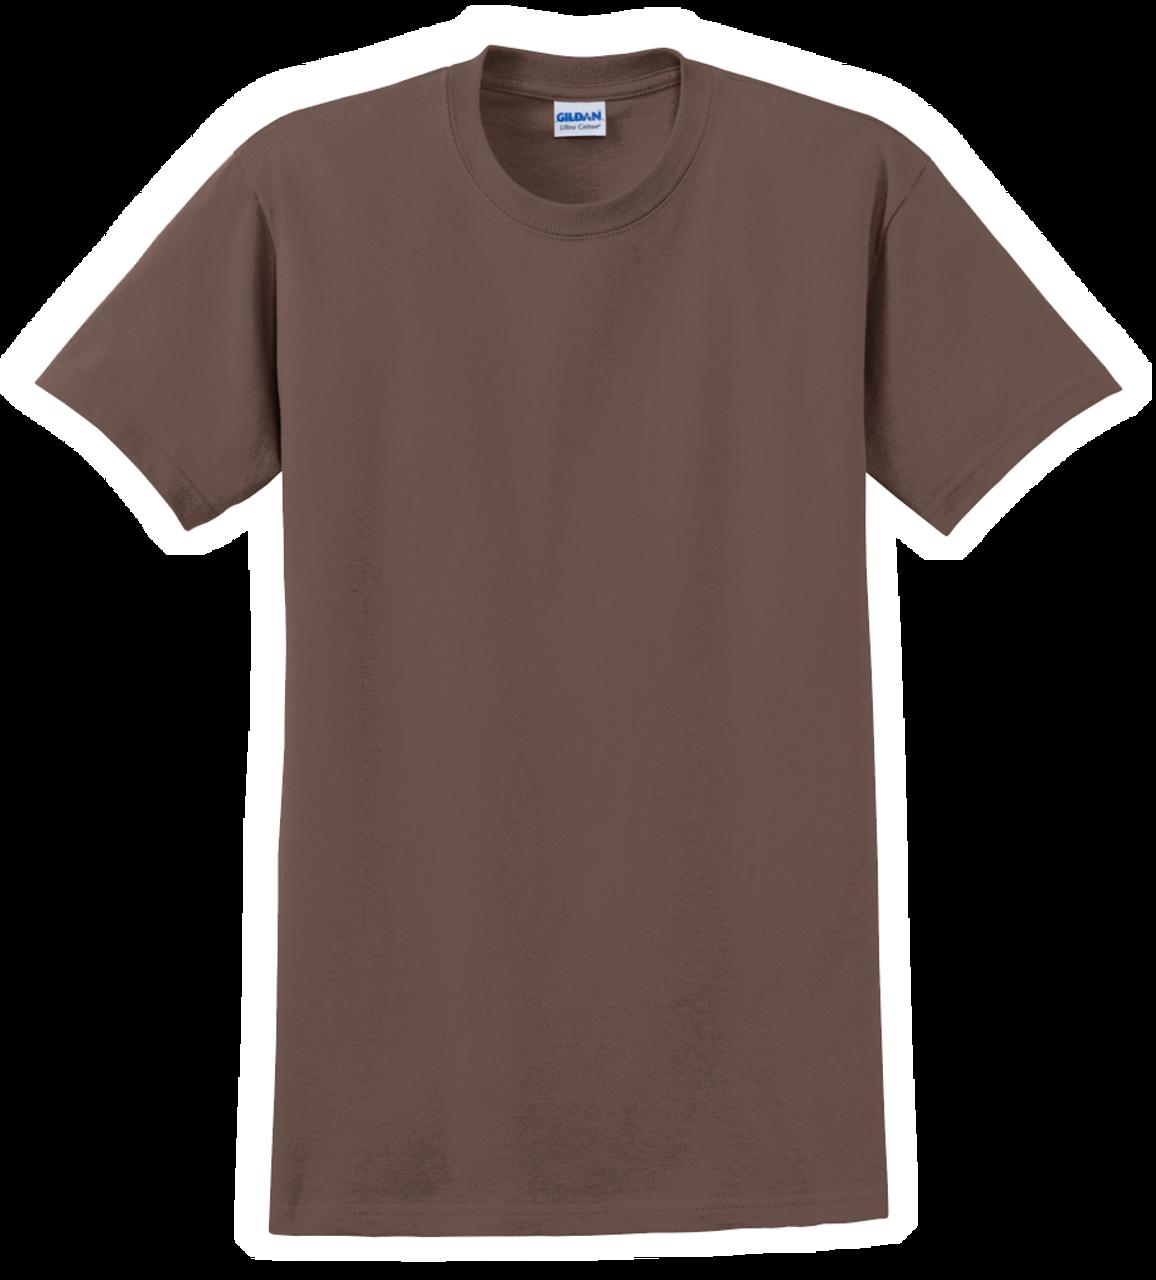 G2000 Chestnut T-Shirt Short Sleeve by Gildan